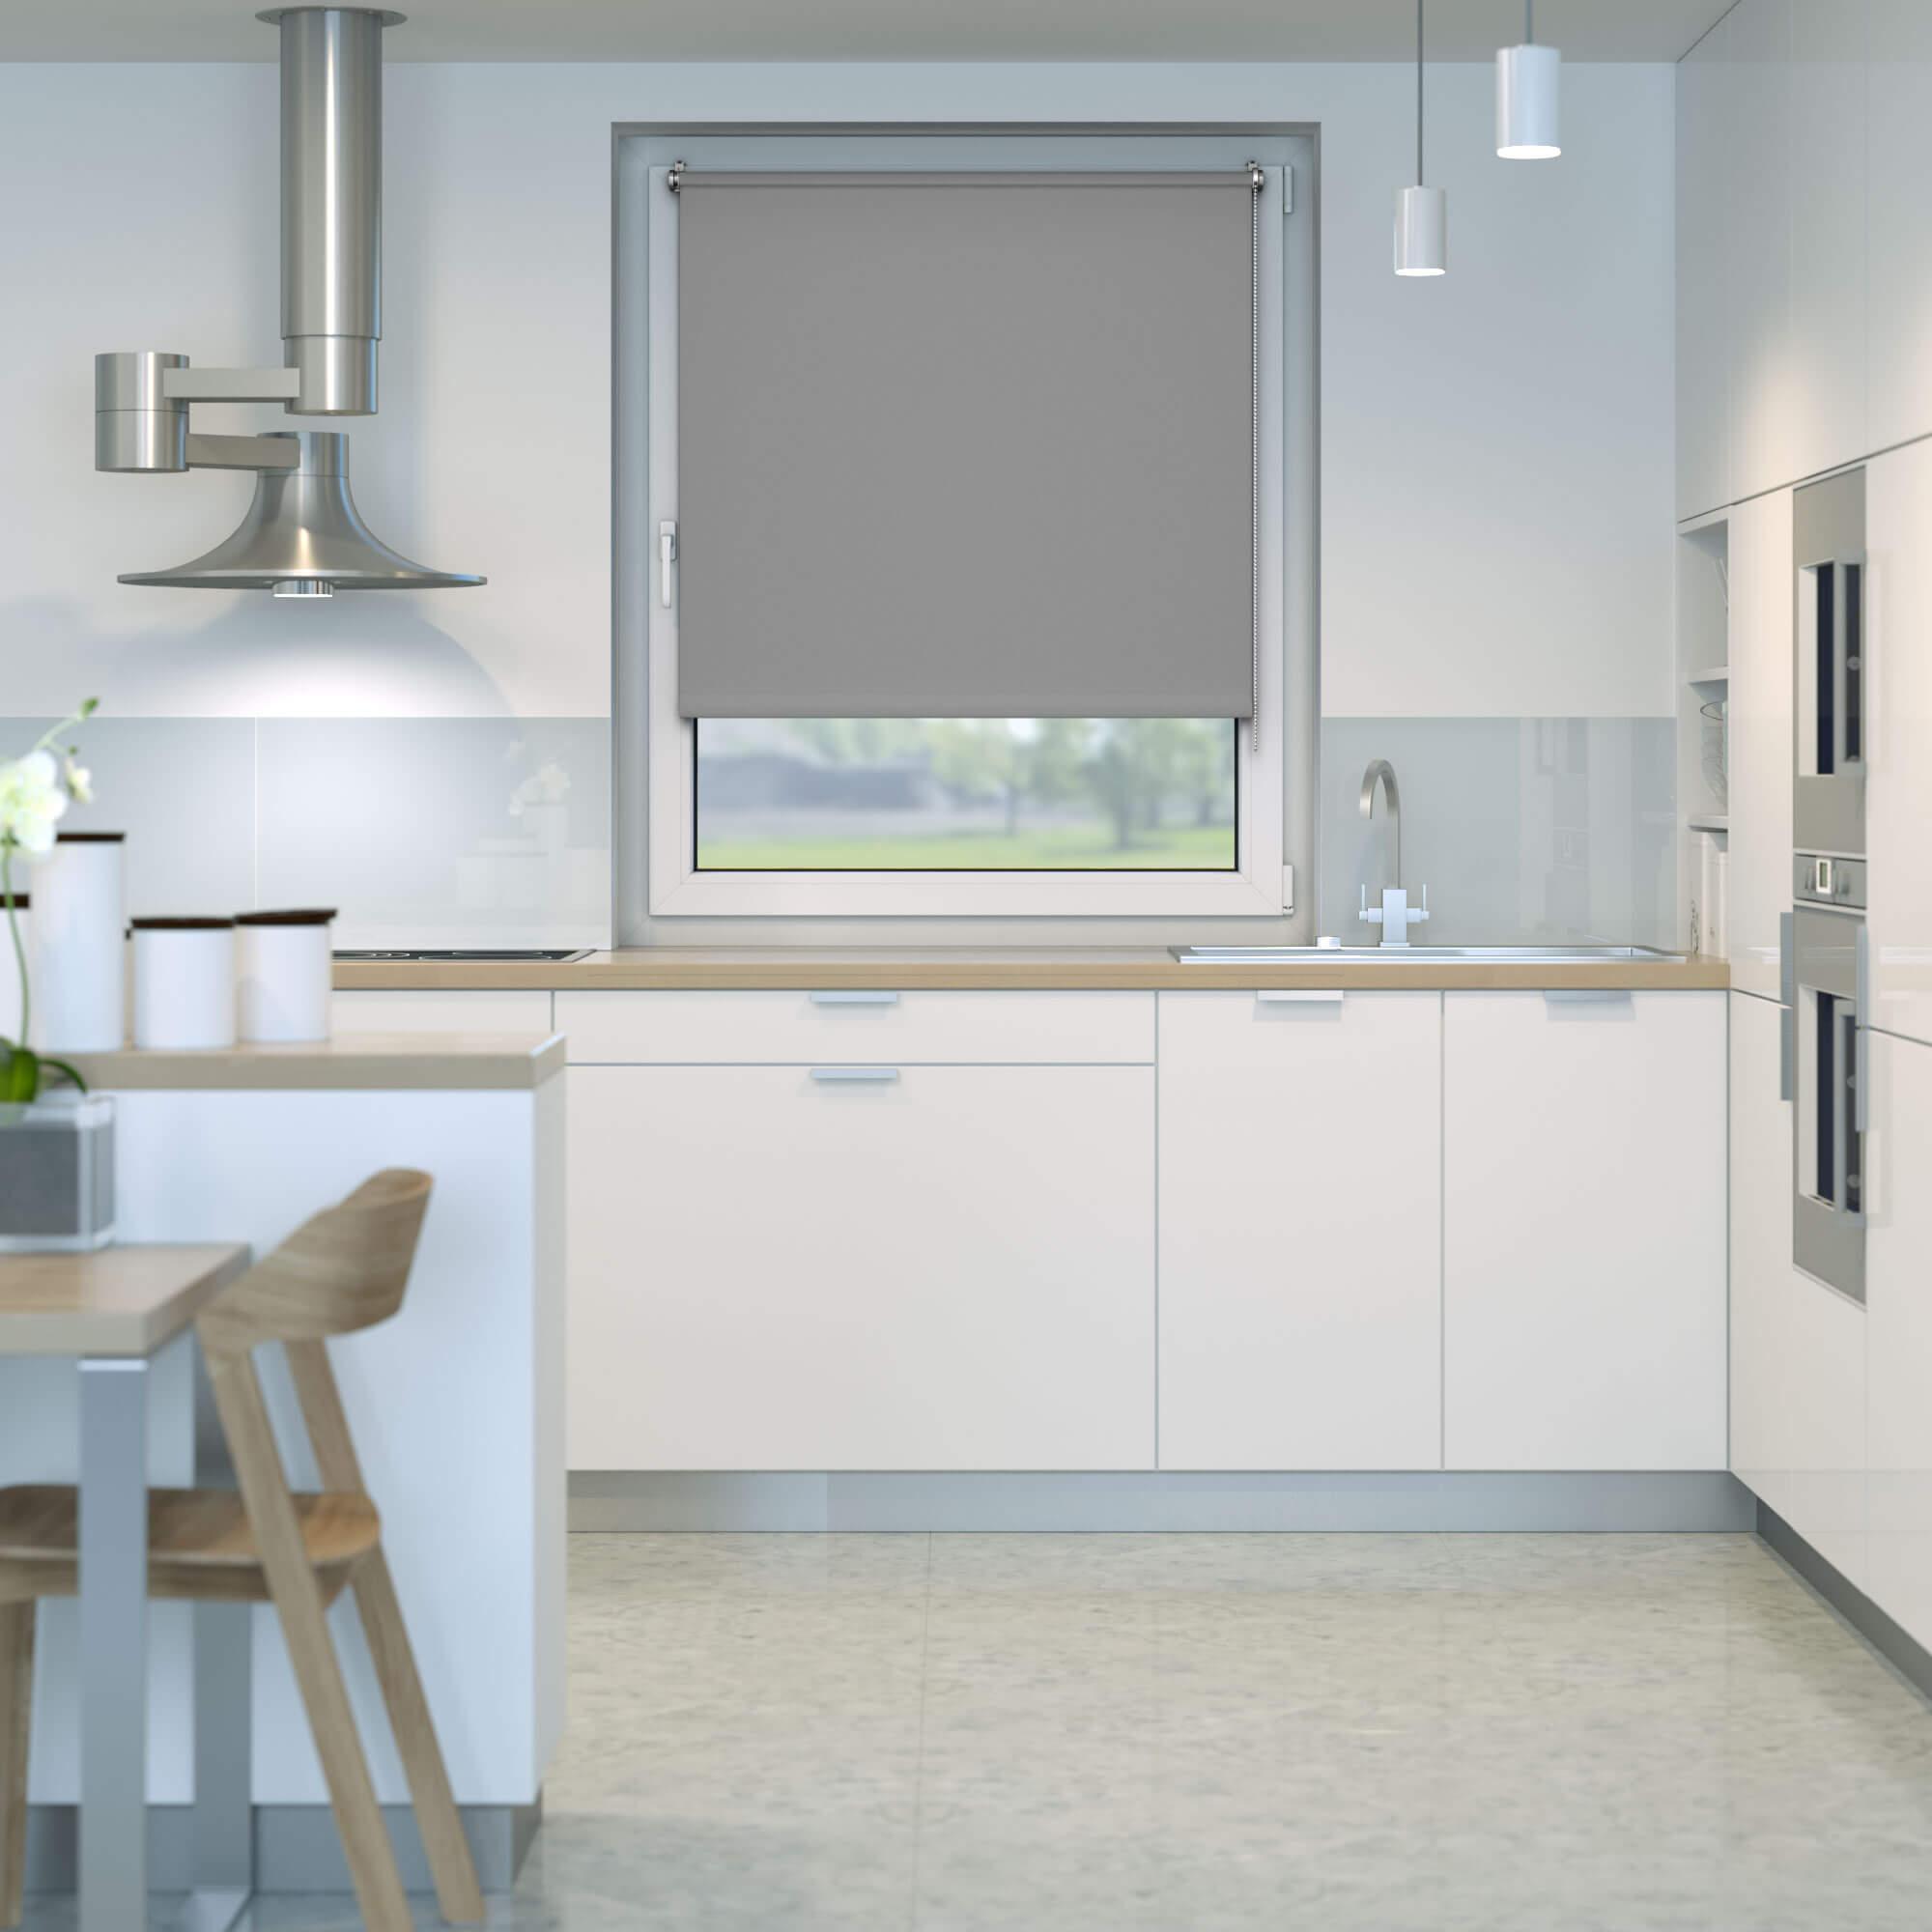 klemmfix verdunkelungsrollo rollo 100 x 150cm grau victoria m standard rollos. Black Bedroom Furniture Sets. Home Design Ideas